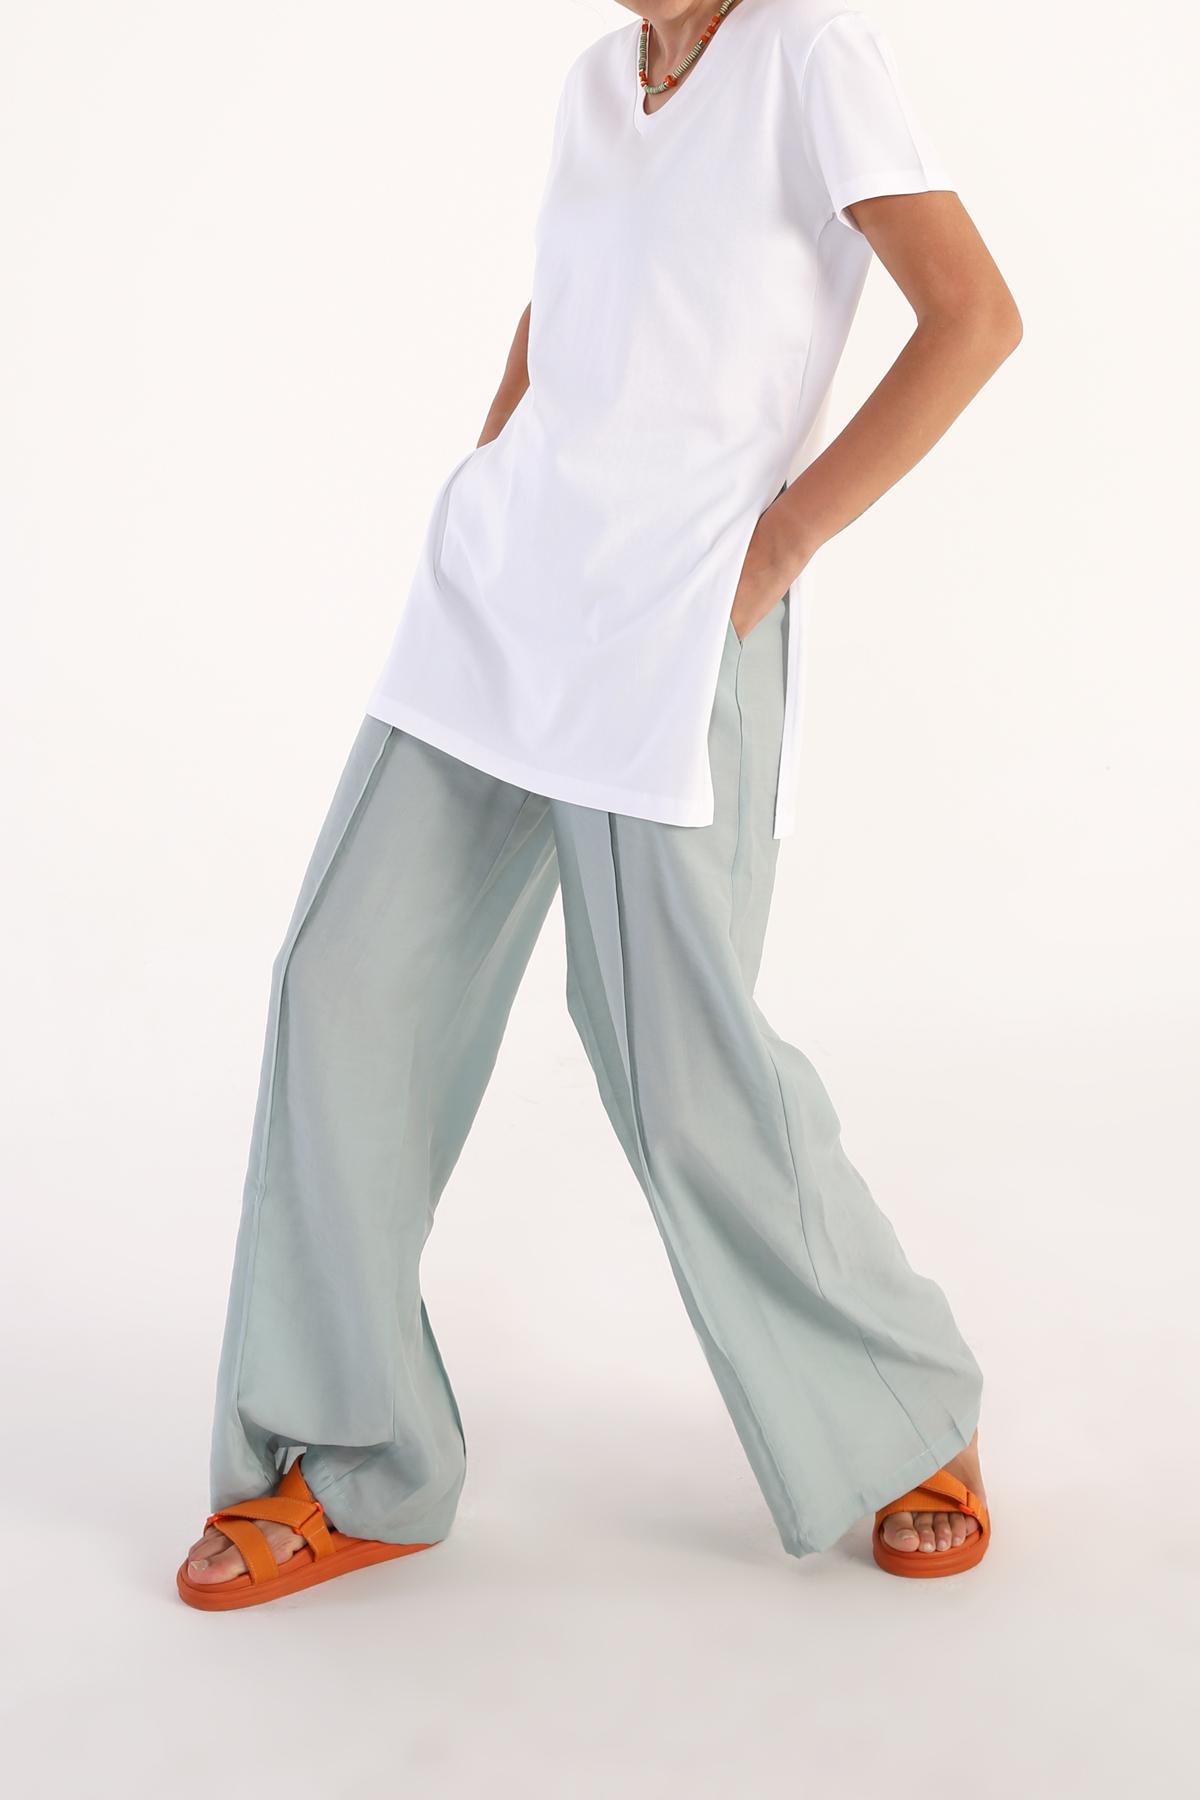 V Neck Basic Cotton T-shirt